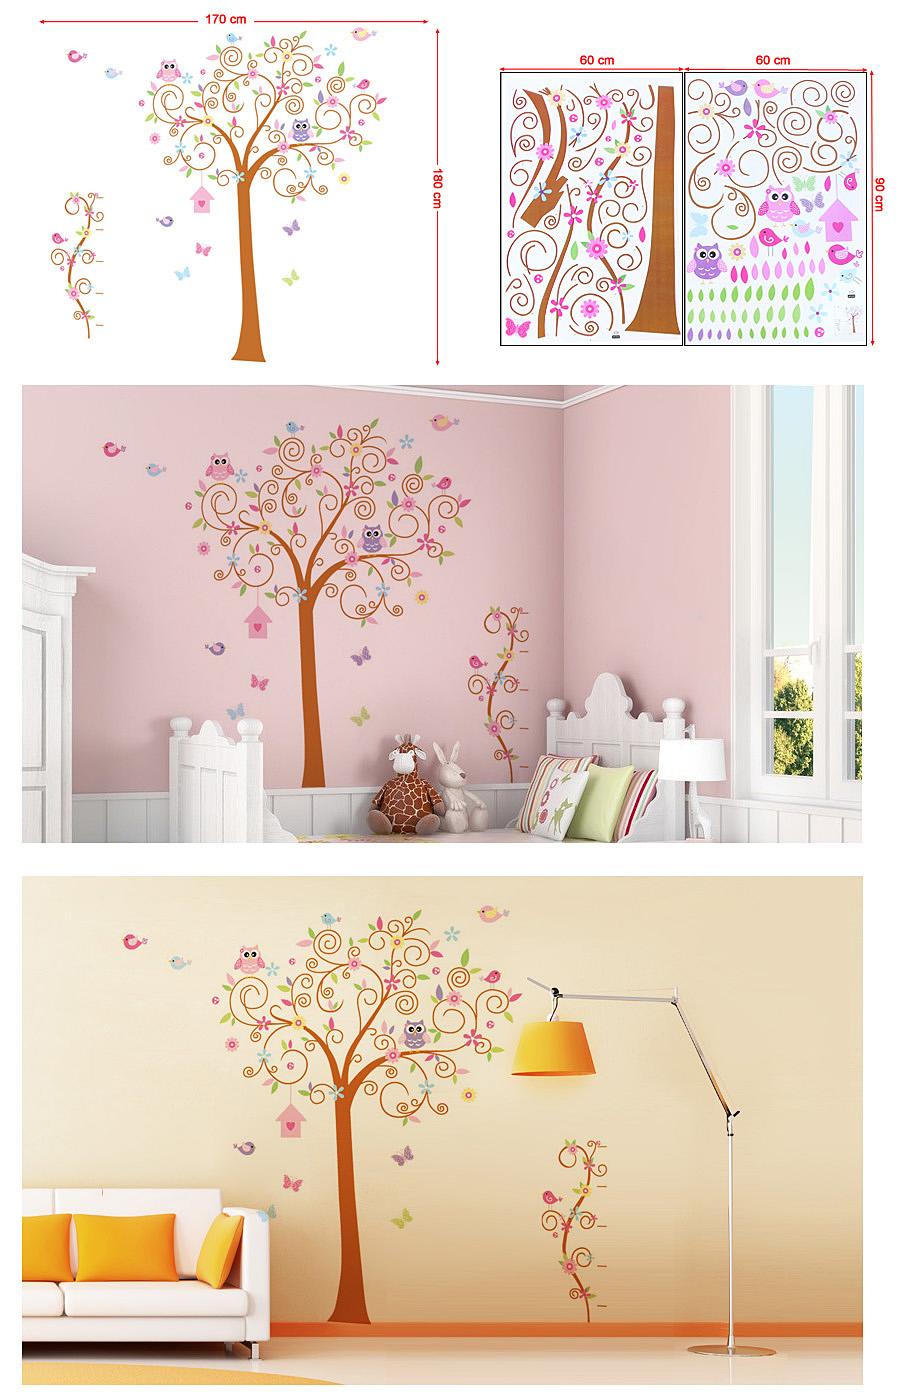 baum wandaufkleber wandsticker wandtattoo wanddekoration 170 x 180cm fwt50c ebay. Black Bedroom Furniture Sets. Home Design Ideas